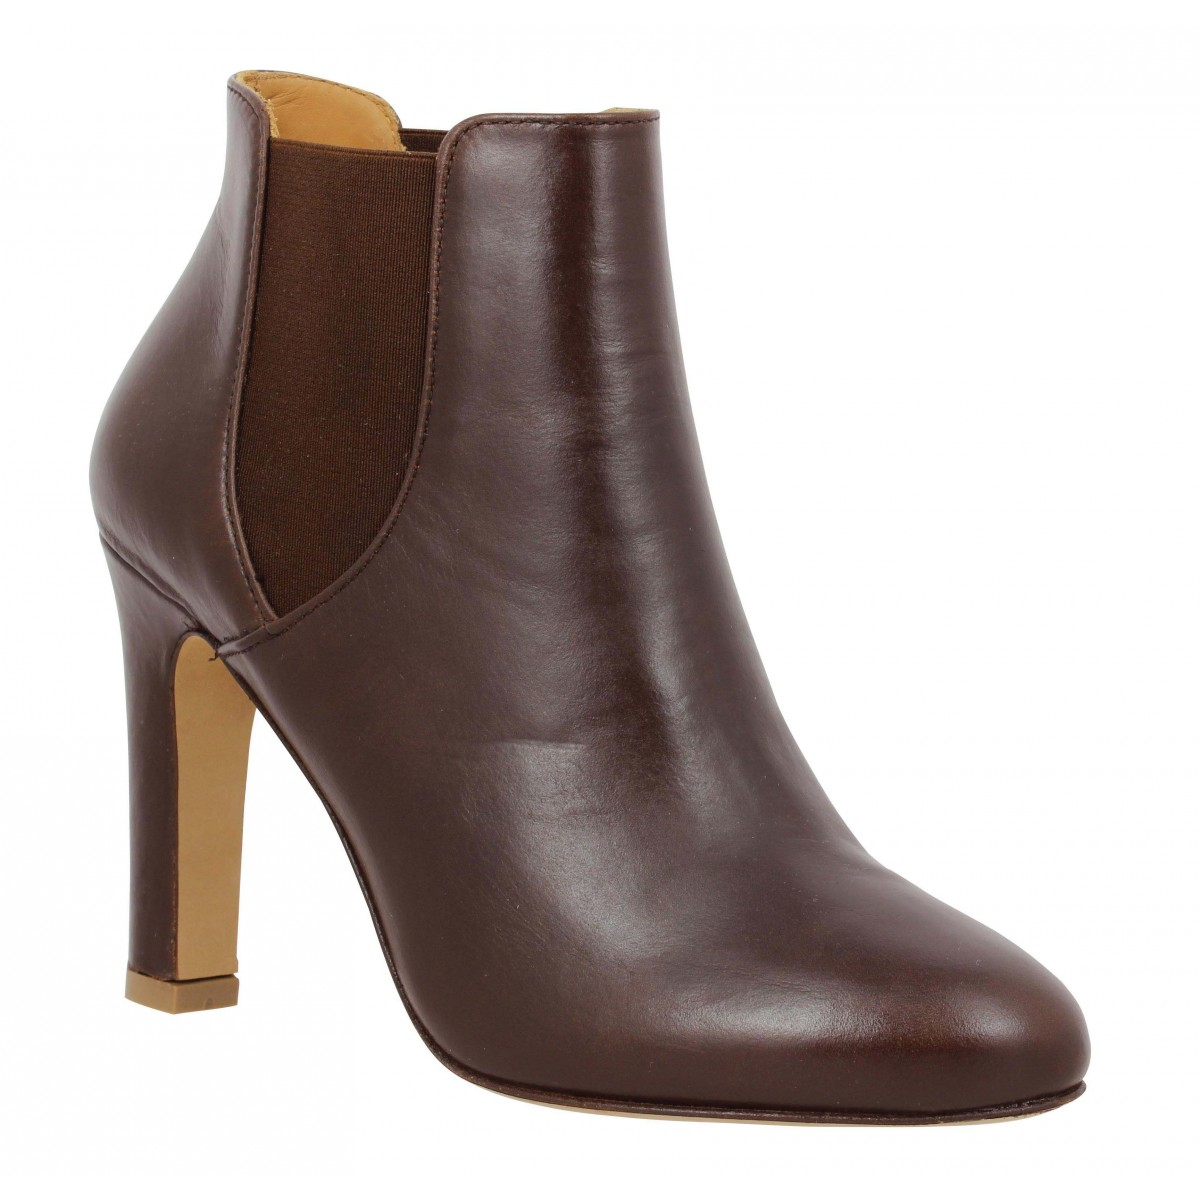 Marron Fanny Bobbies Amante Cuir Femme Chaussures L XxXaq78I